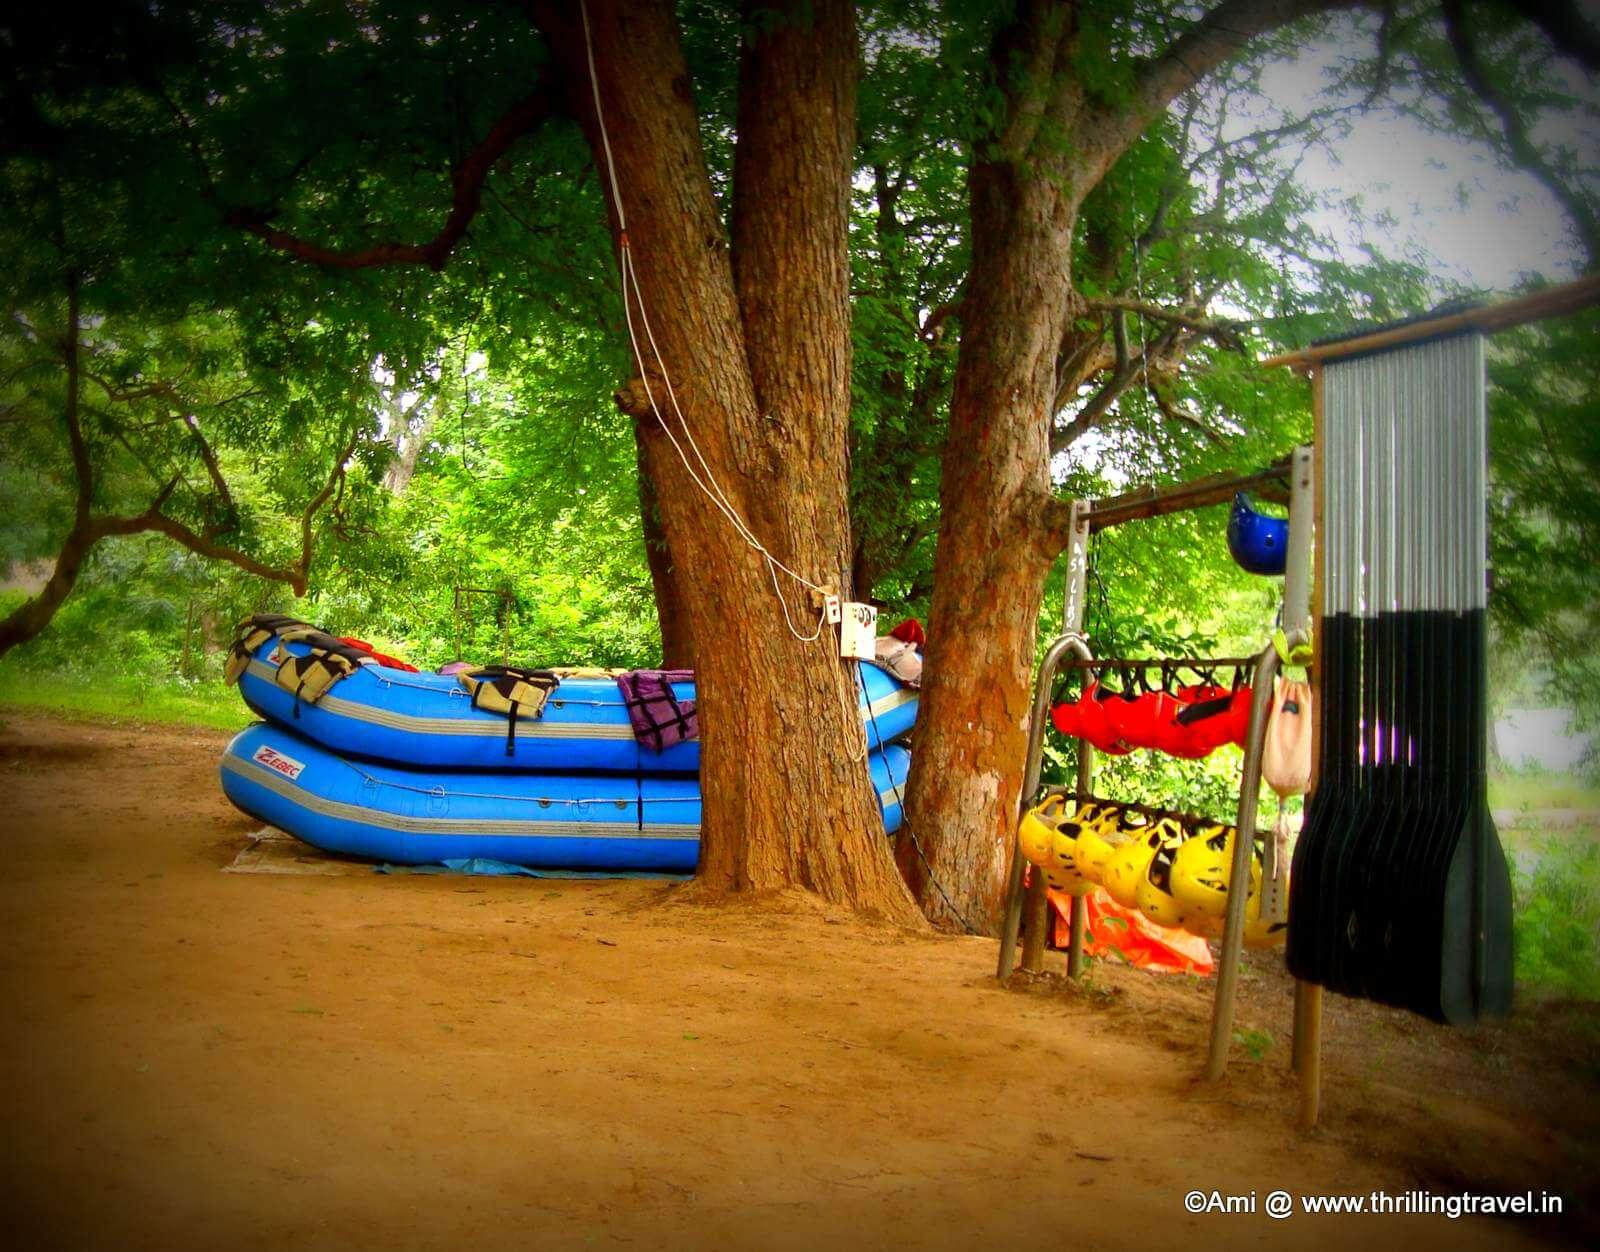 Adventure Sports at Bheemeshwari Fishing Camp